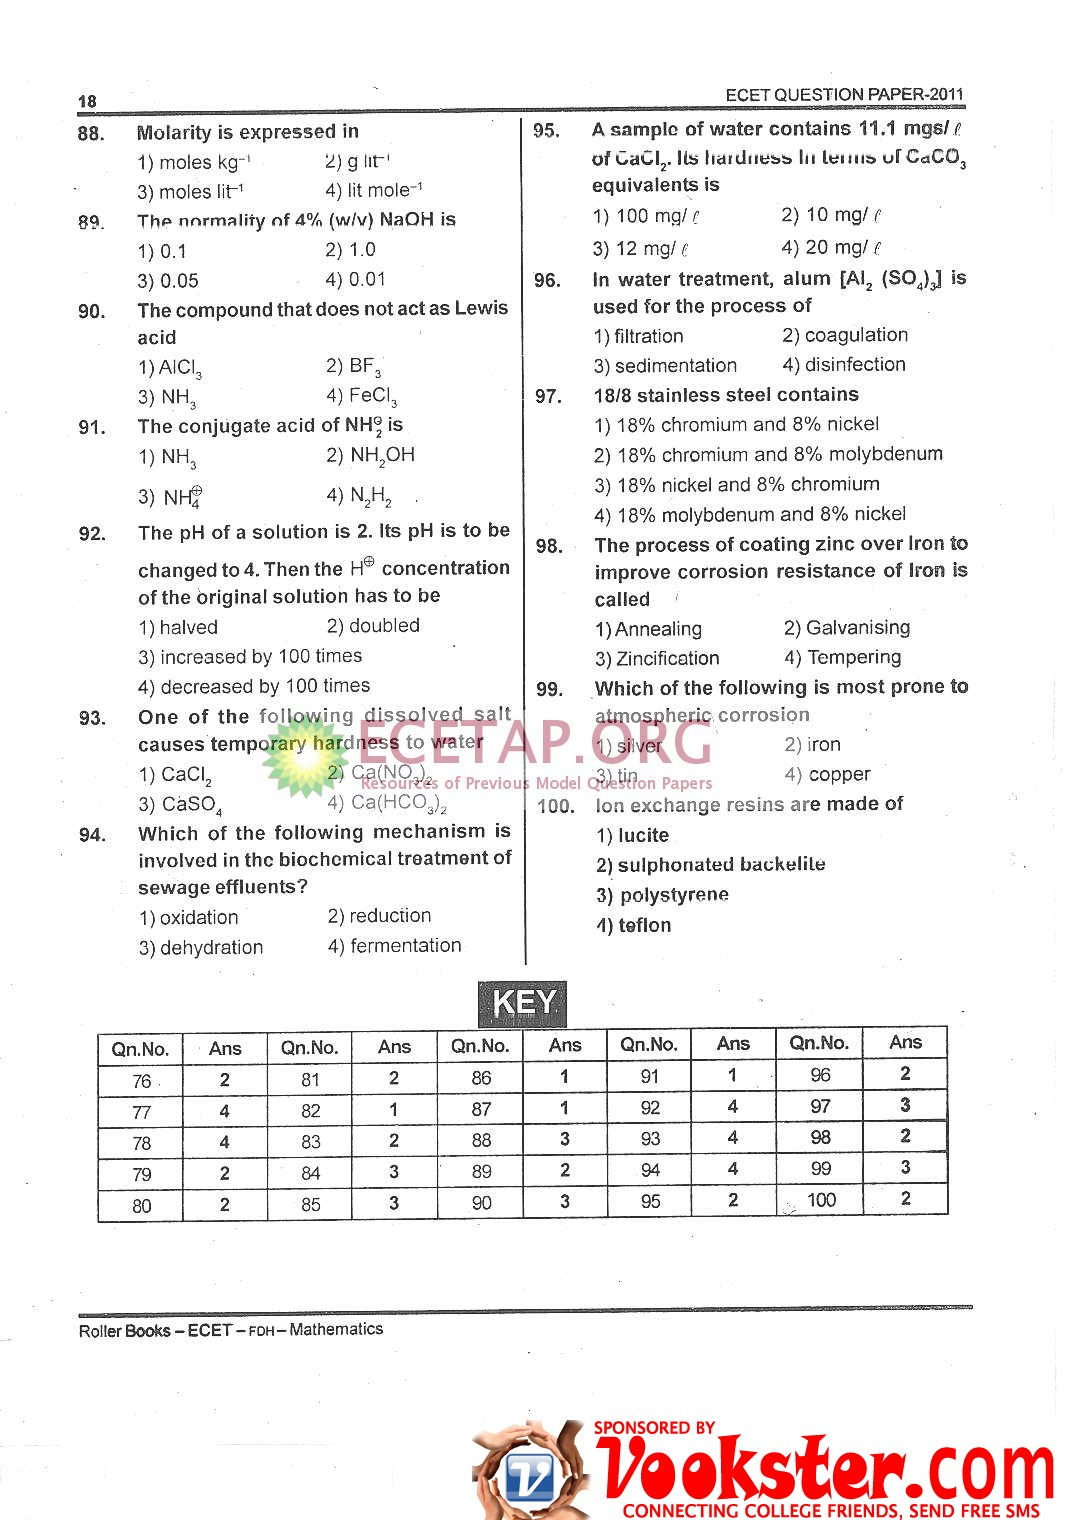 ECET MATERIAL FOR CSE PDF - elicitdownload.info